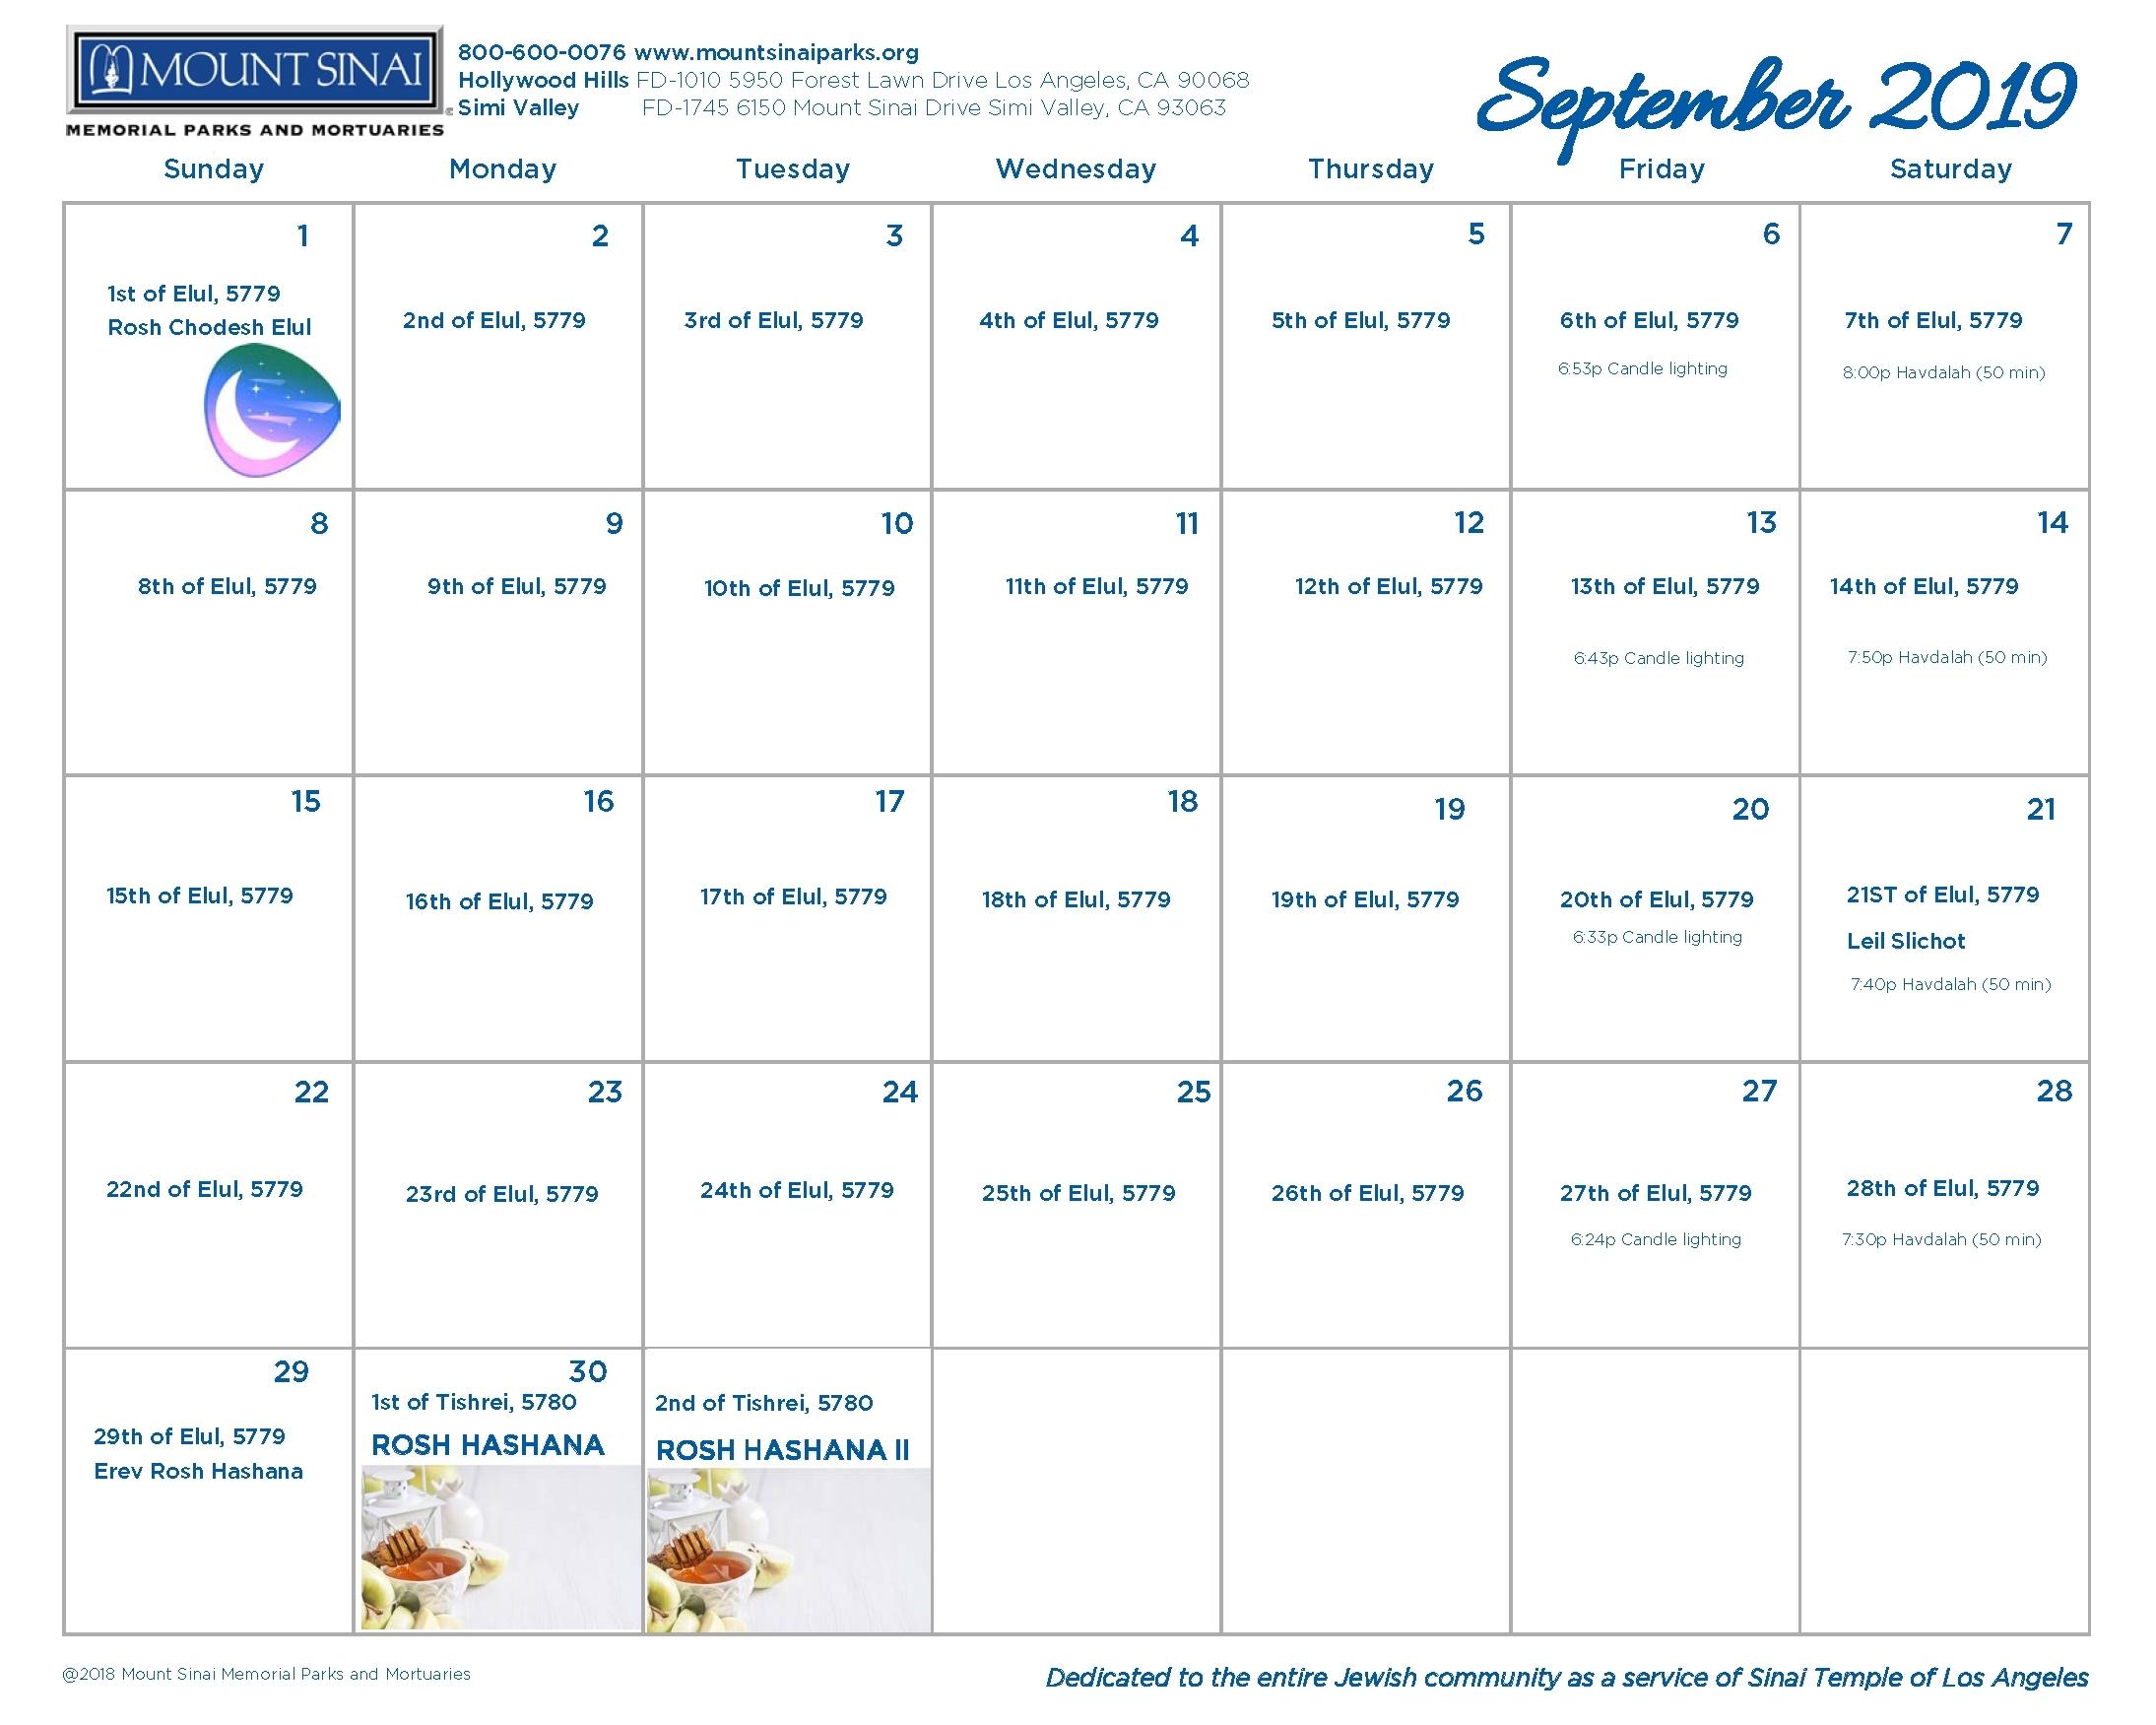 5779 Hebrew Calendar Mount Sinai Memorial Parks And-January 2020 Hebrew Calendar